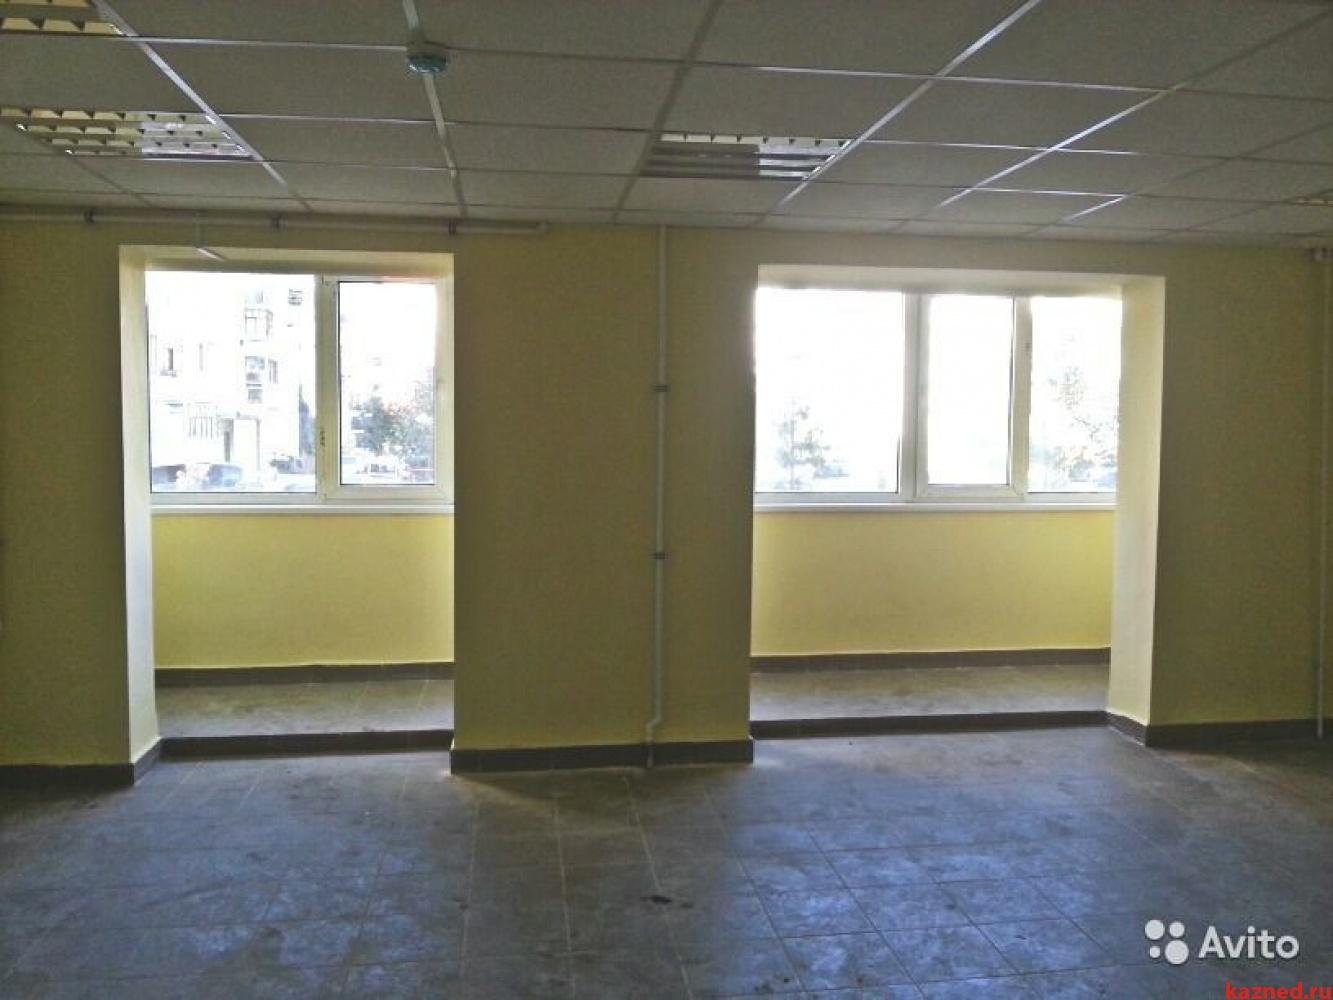 Продажа  помещения свободного назначения Академика Сахарова, 10, 74 м2  (миниатюра №5)